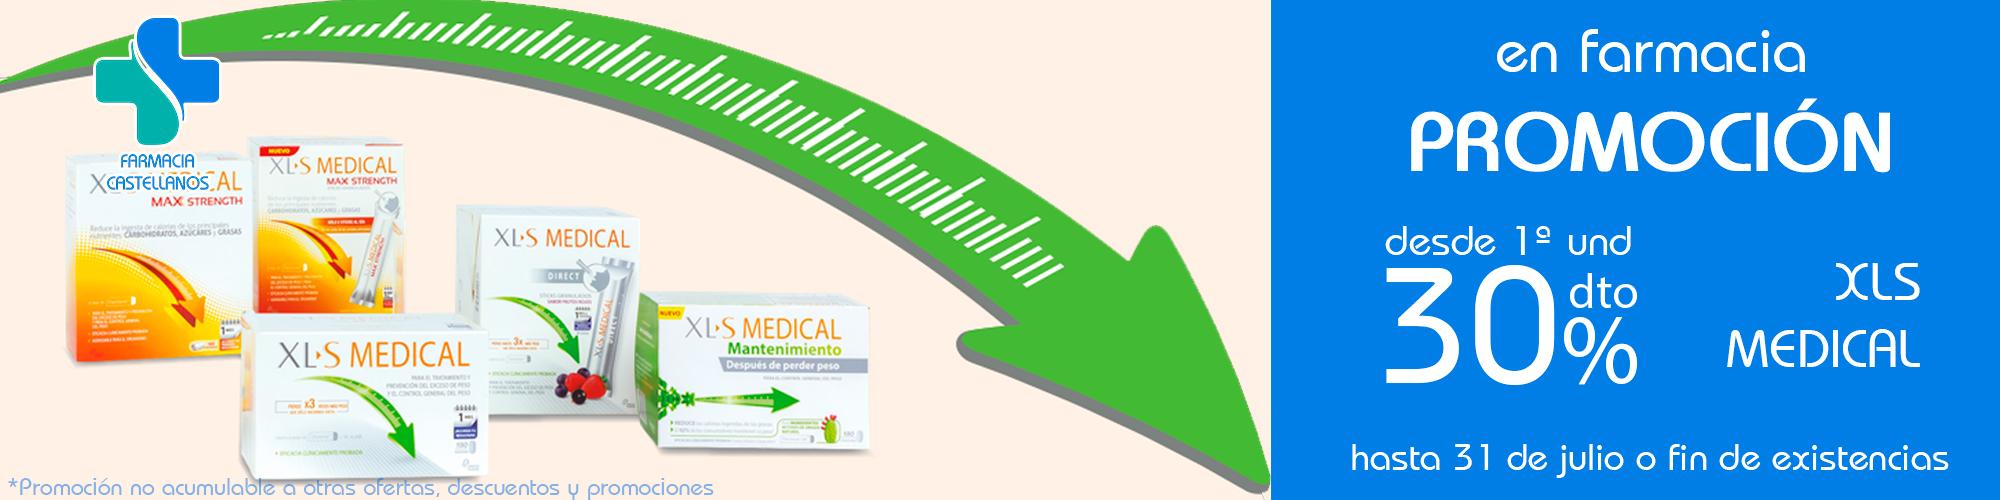 promo-xls-medical-julio-farmaciabeatrizcastellanos